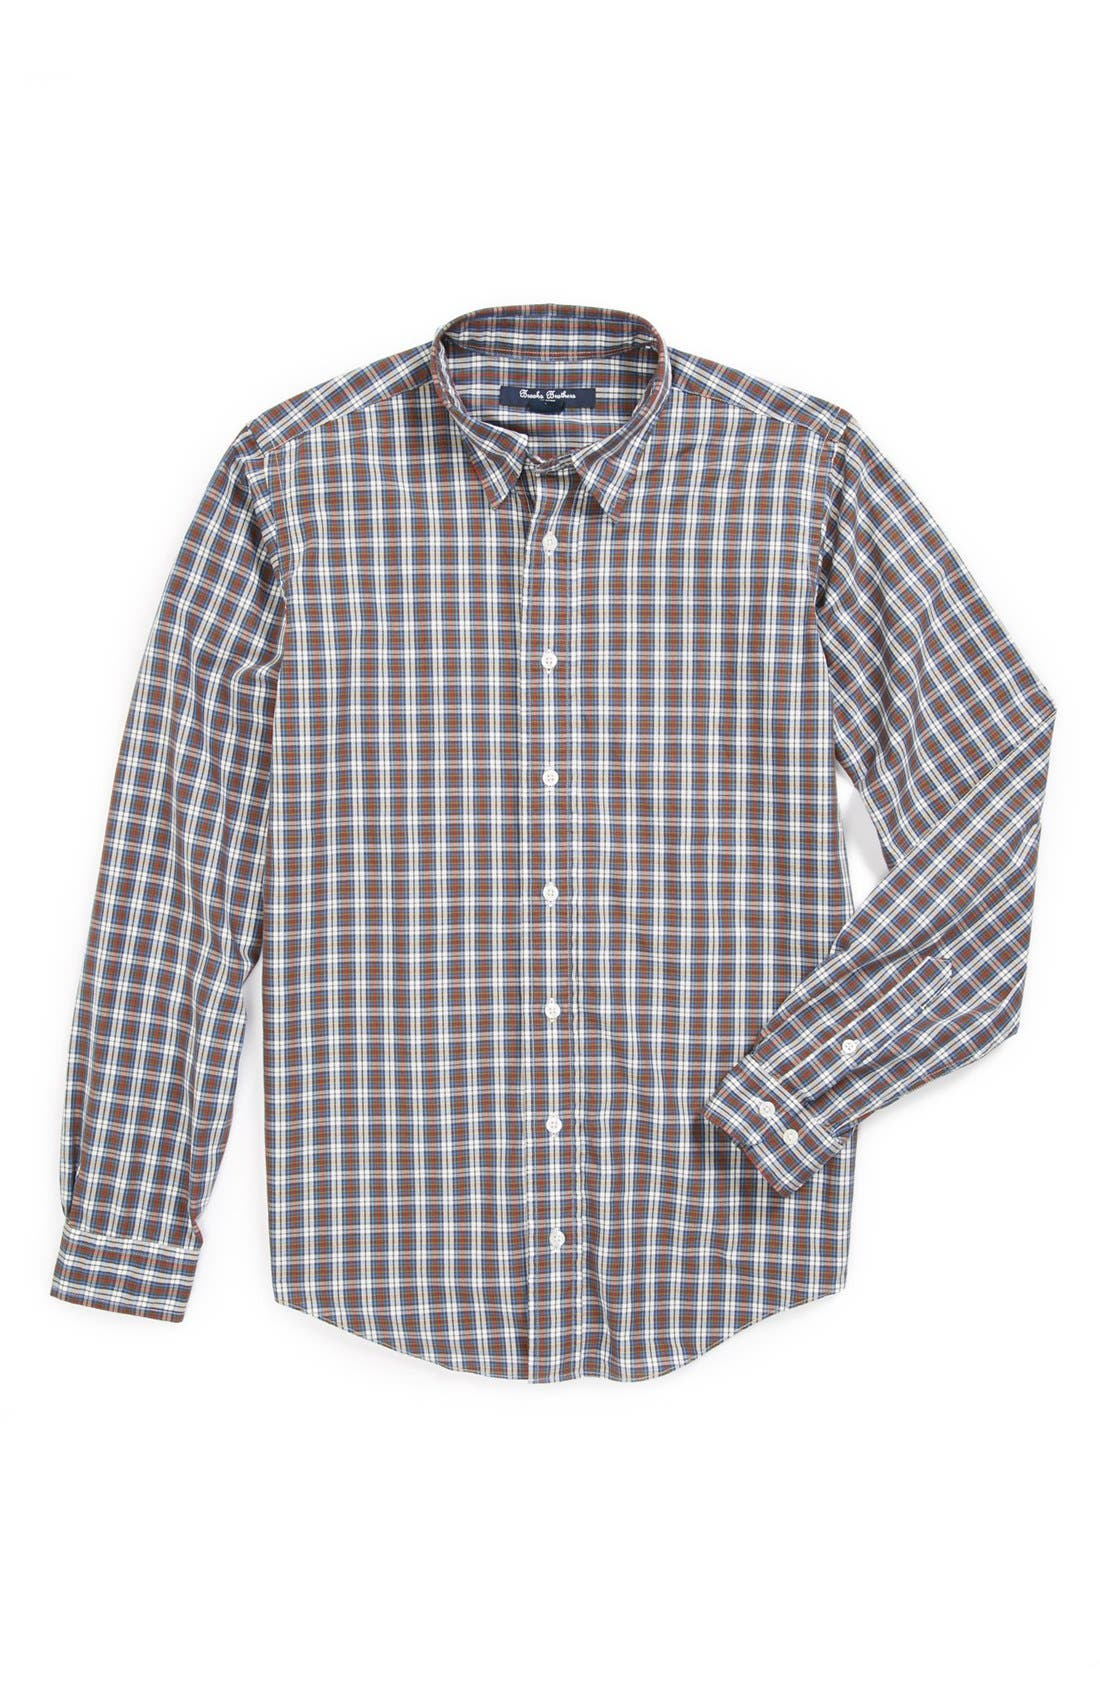 Alternate Image 1 Selected - Brooks Brothers Plaid Dress Shirt (Big Boys)